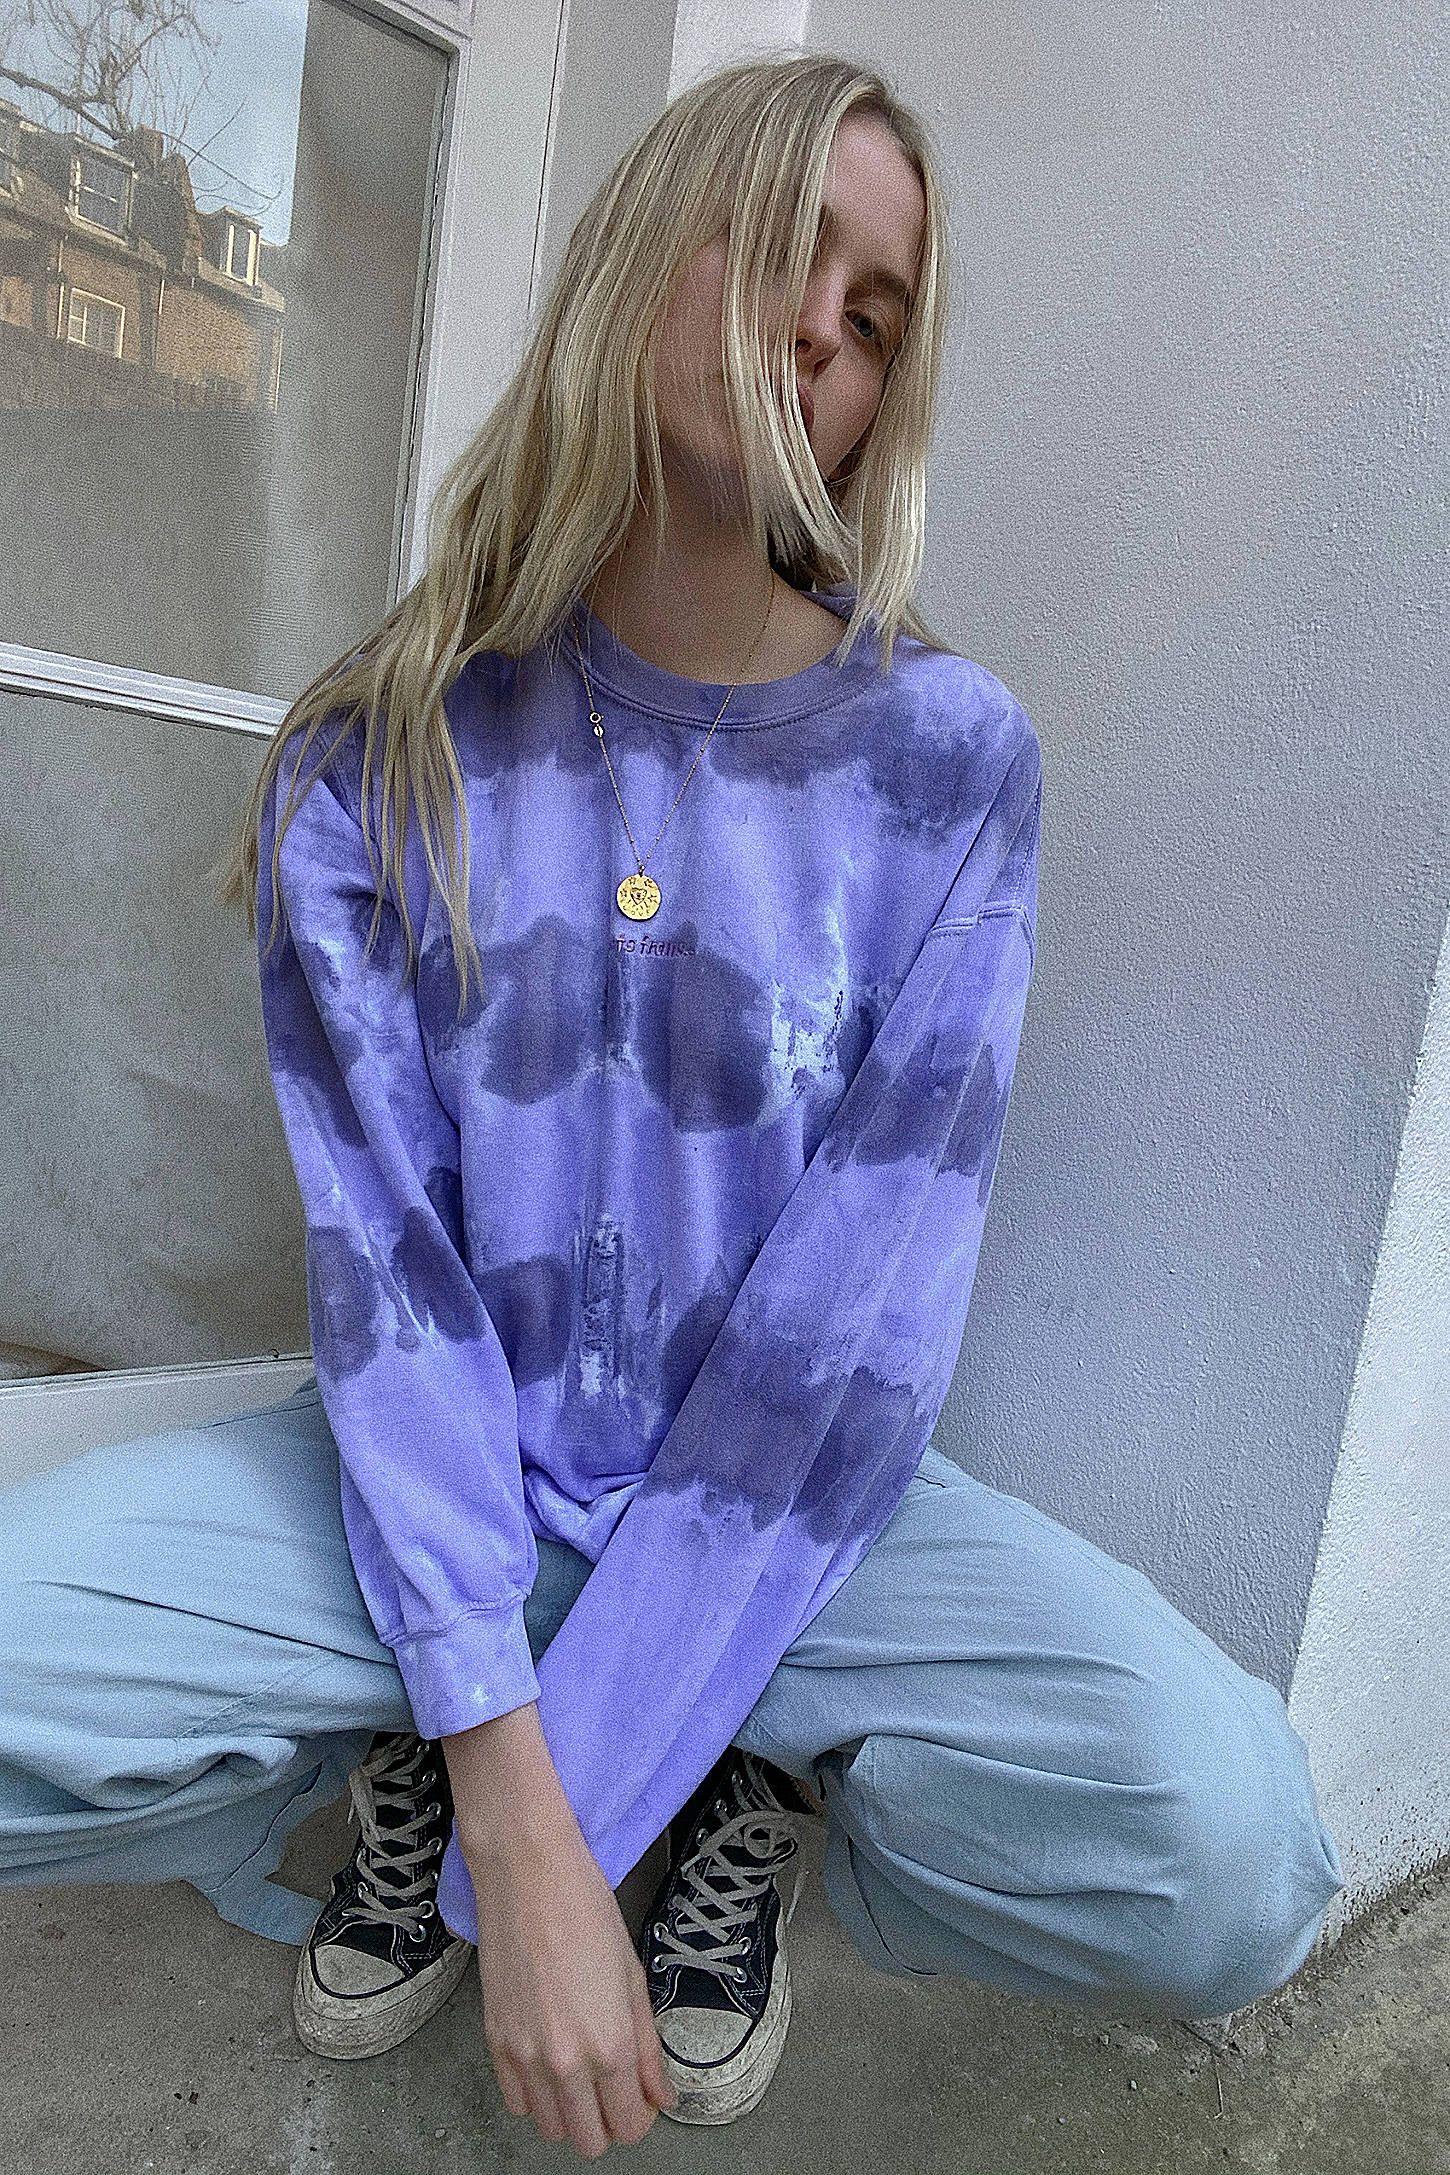 Iets Frans Purple Tie Dye Crew Neck Sweatshirt Tie Dye Crew Neck Sweatshirt Purple Tie Dye [ 2175 x 1450 Pixel ]